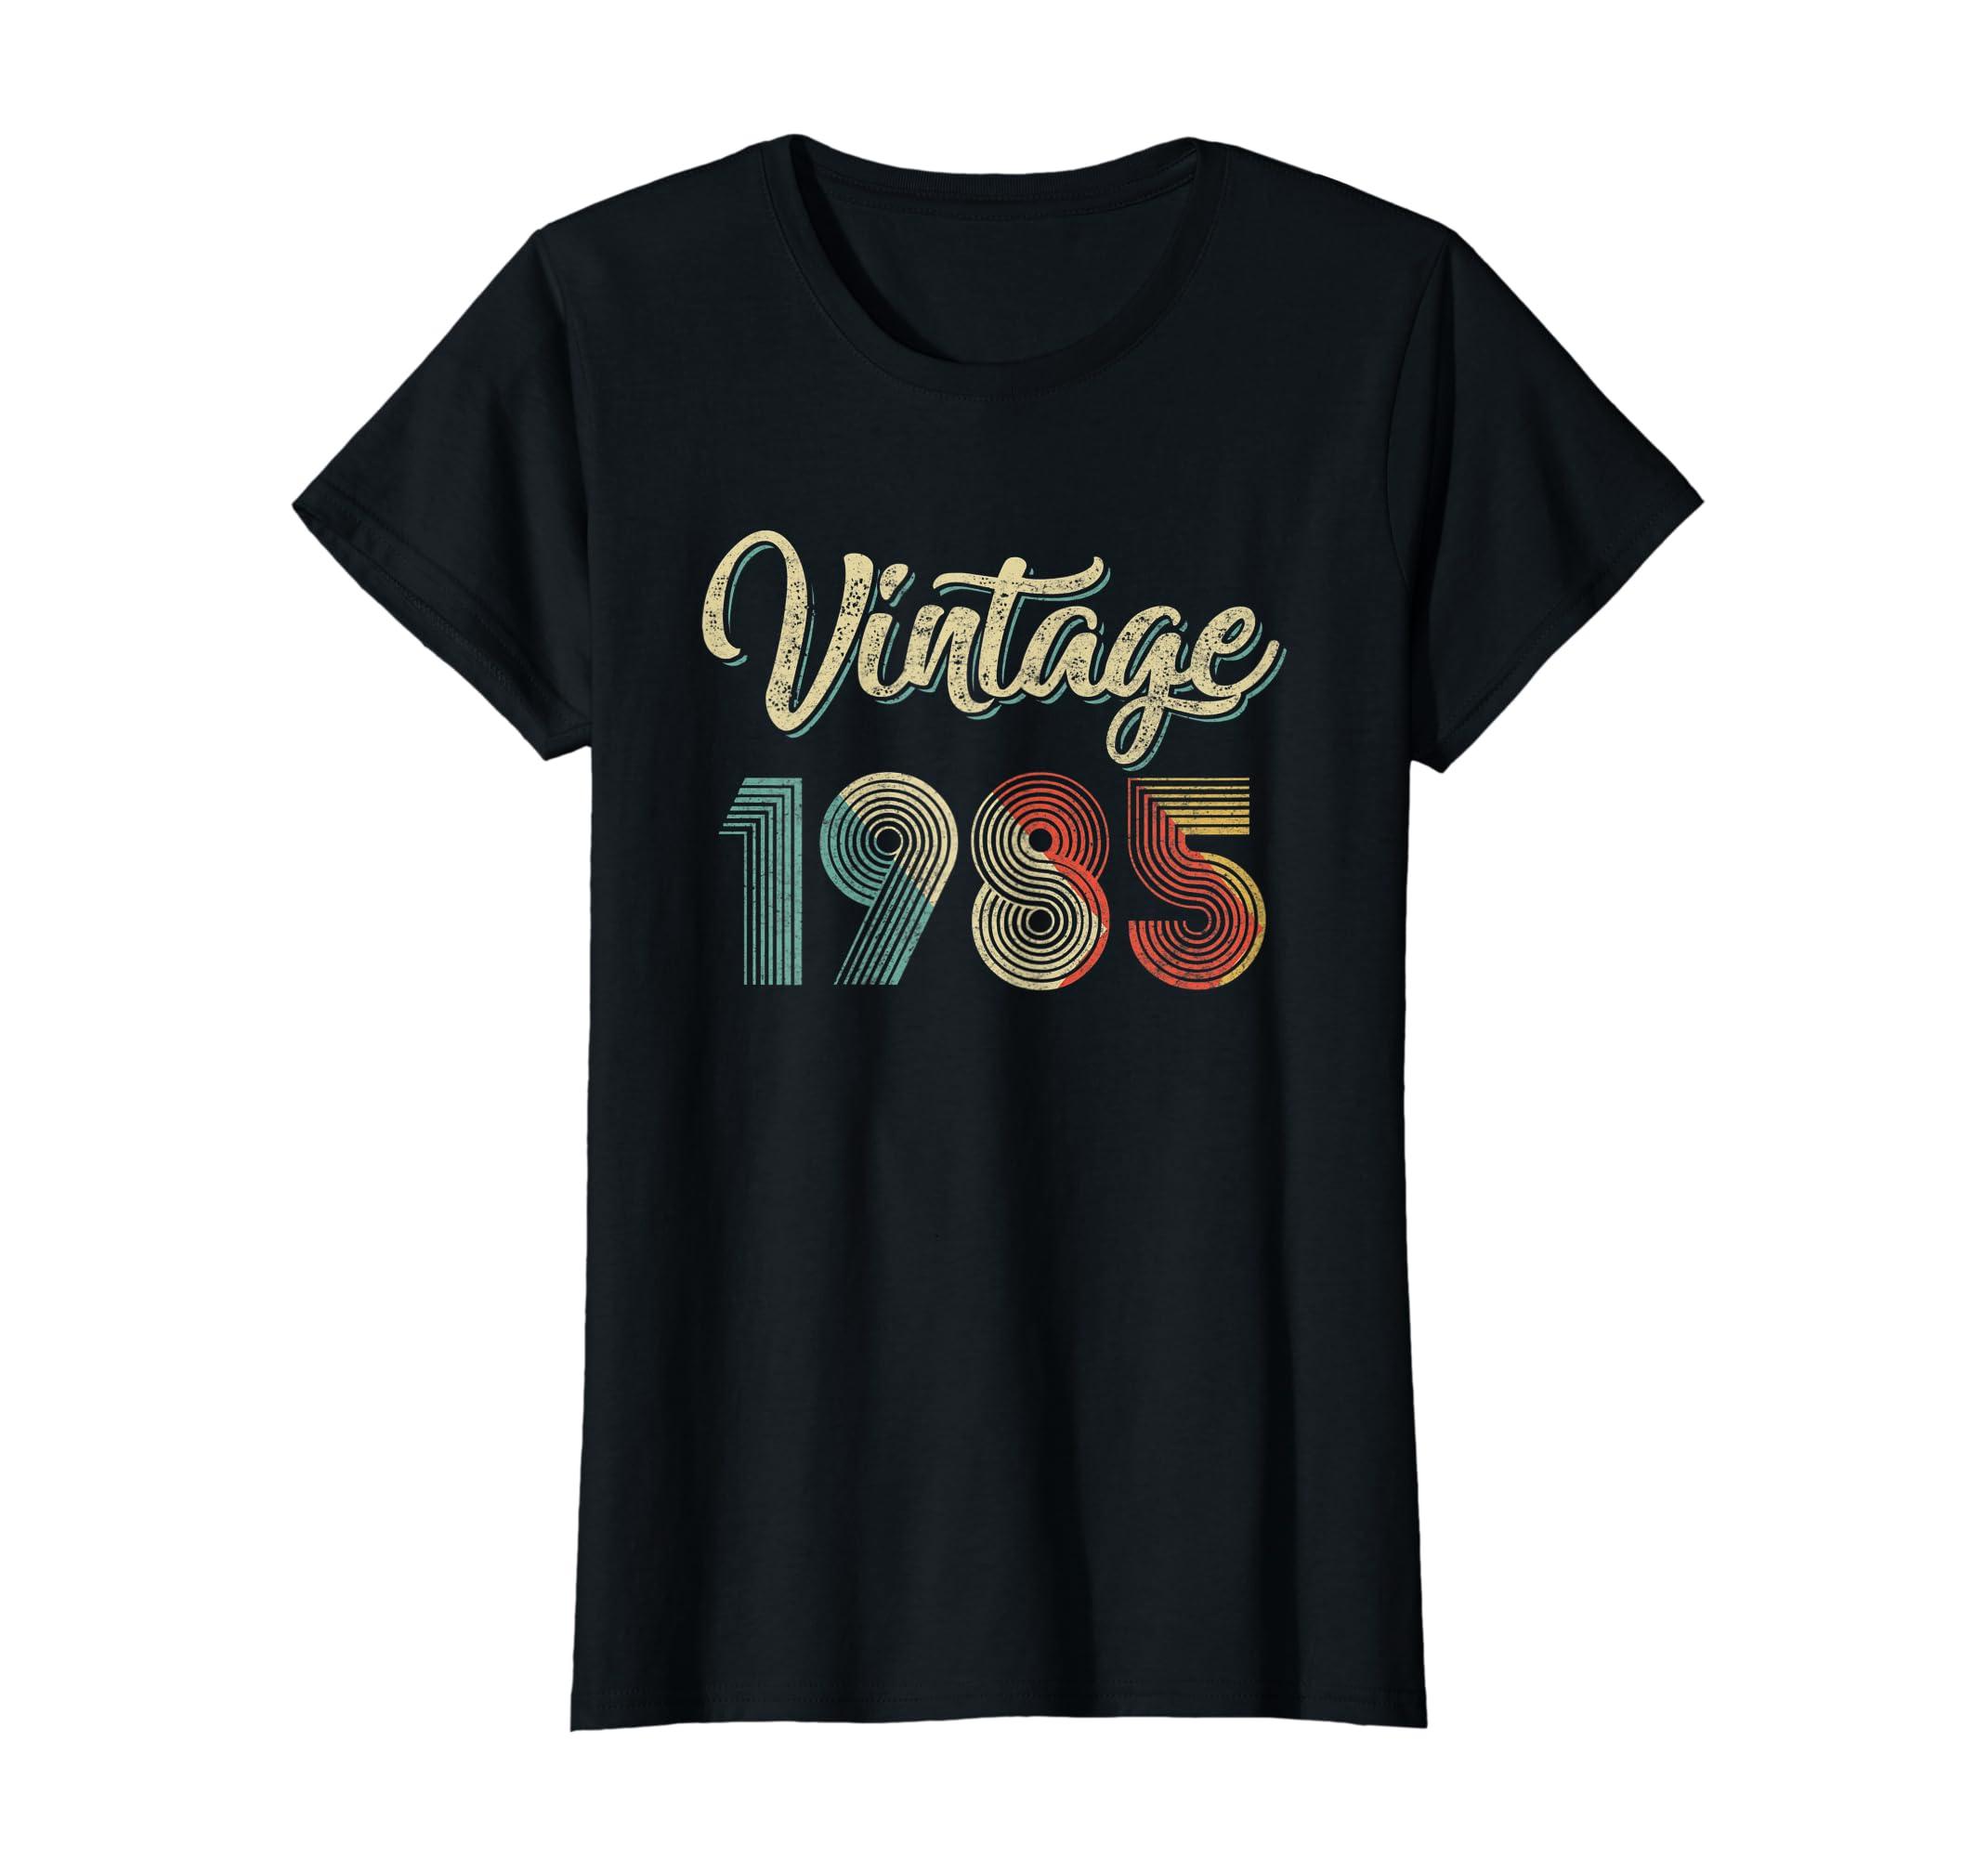 19c25f6d4008f Amazon.com: Vintage Retro 1985 34th years old Classic Birthday T ...